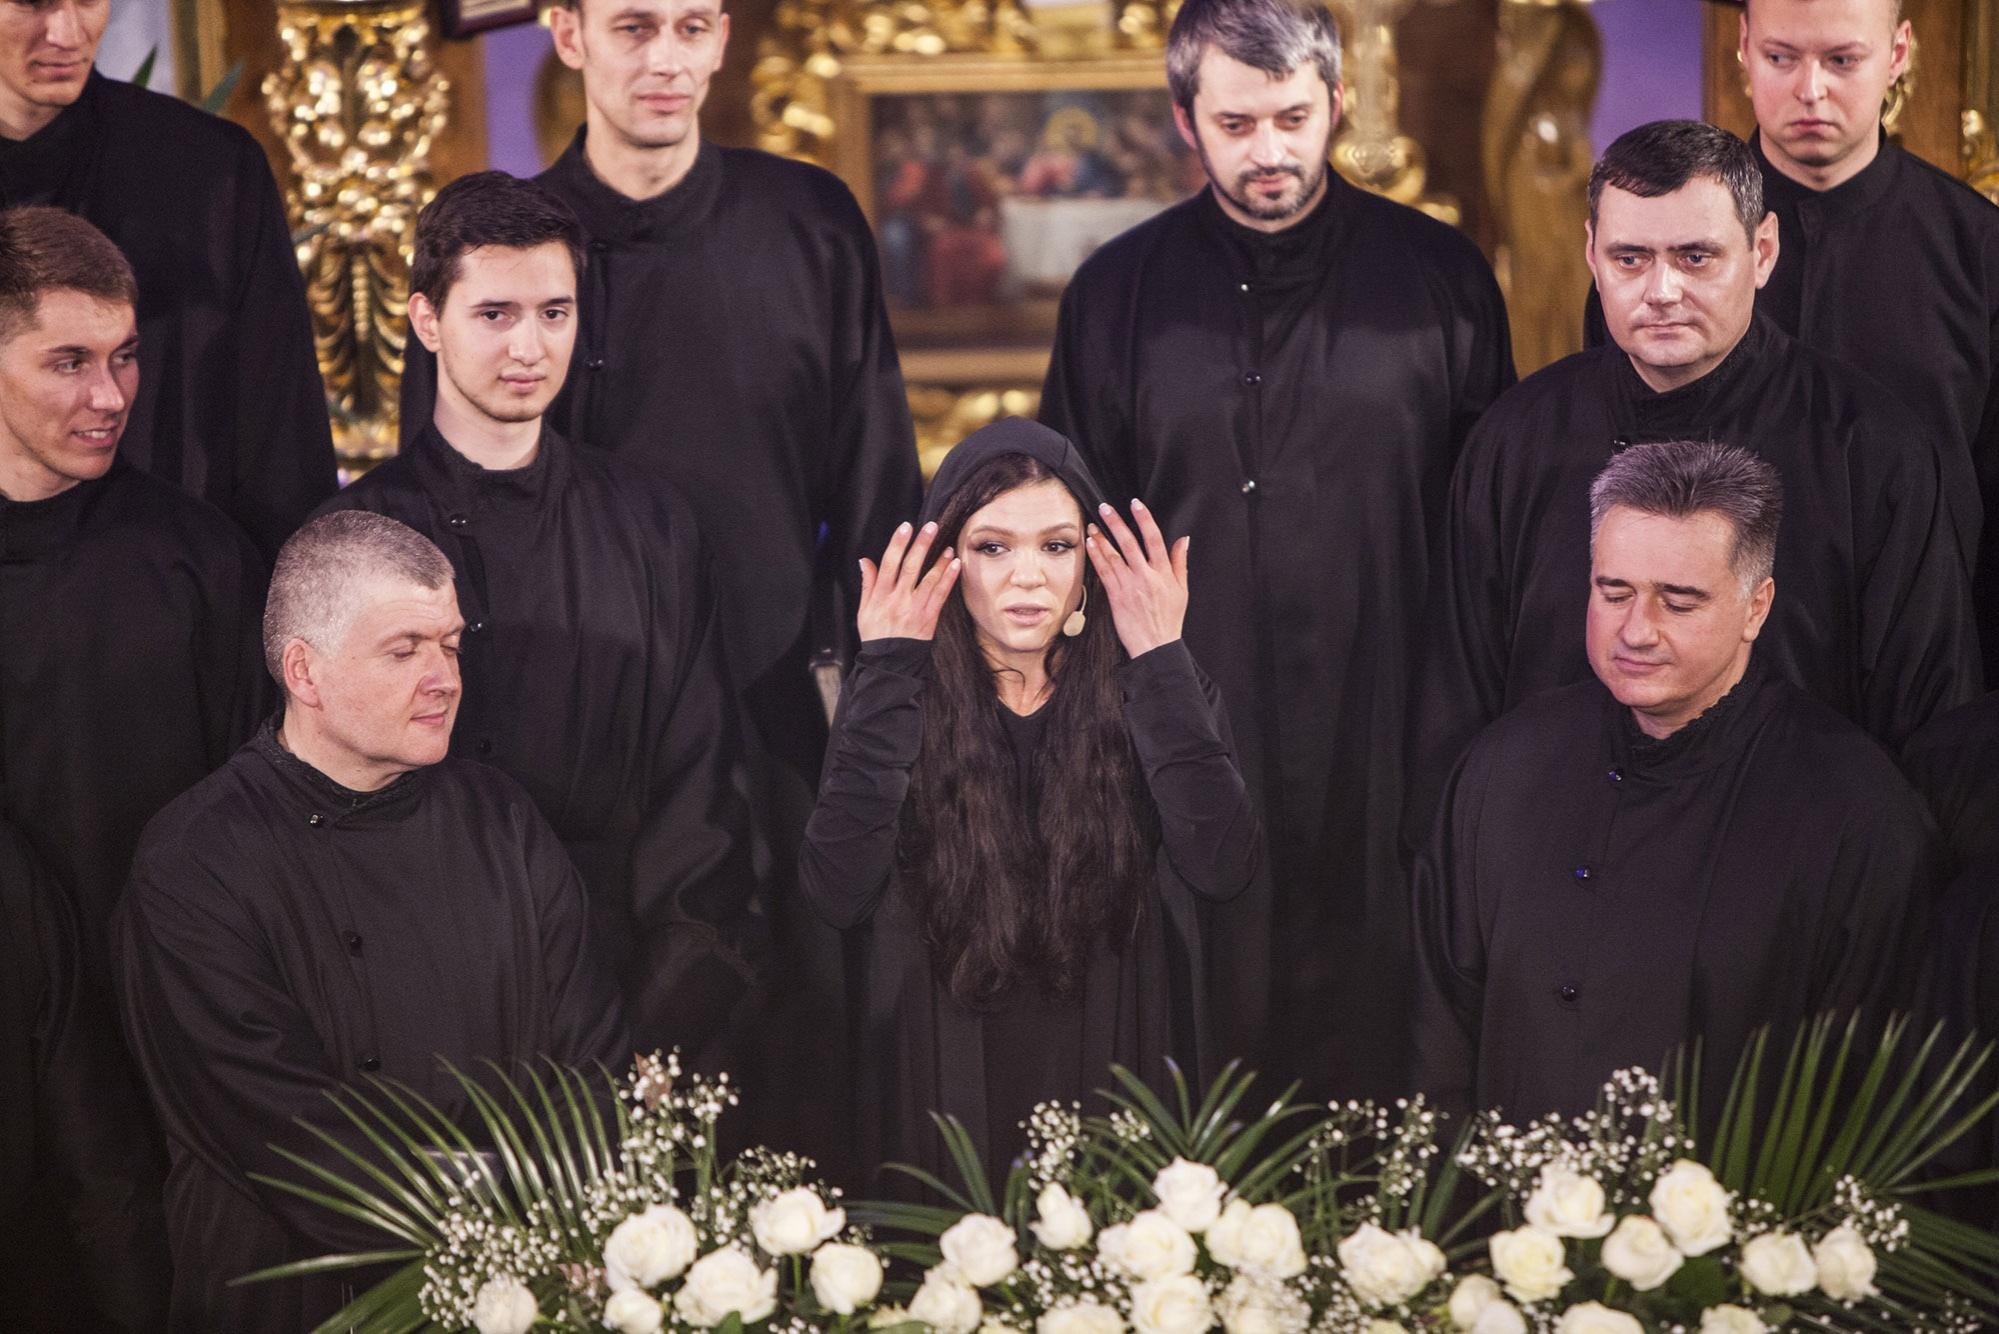 ruslana-vozrodila-legendu-pro-chudotvornuyu-molitvu-1_01